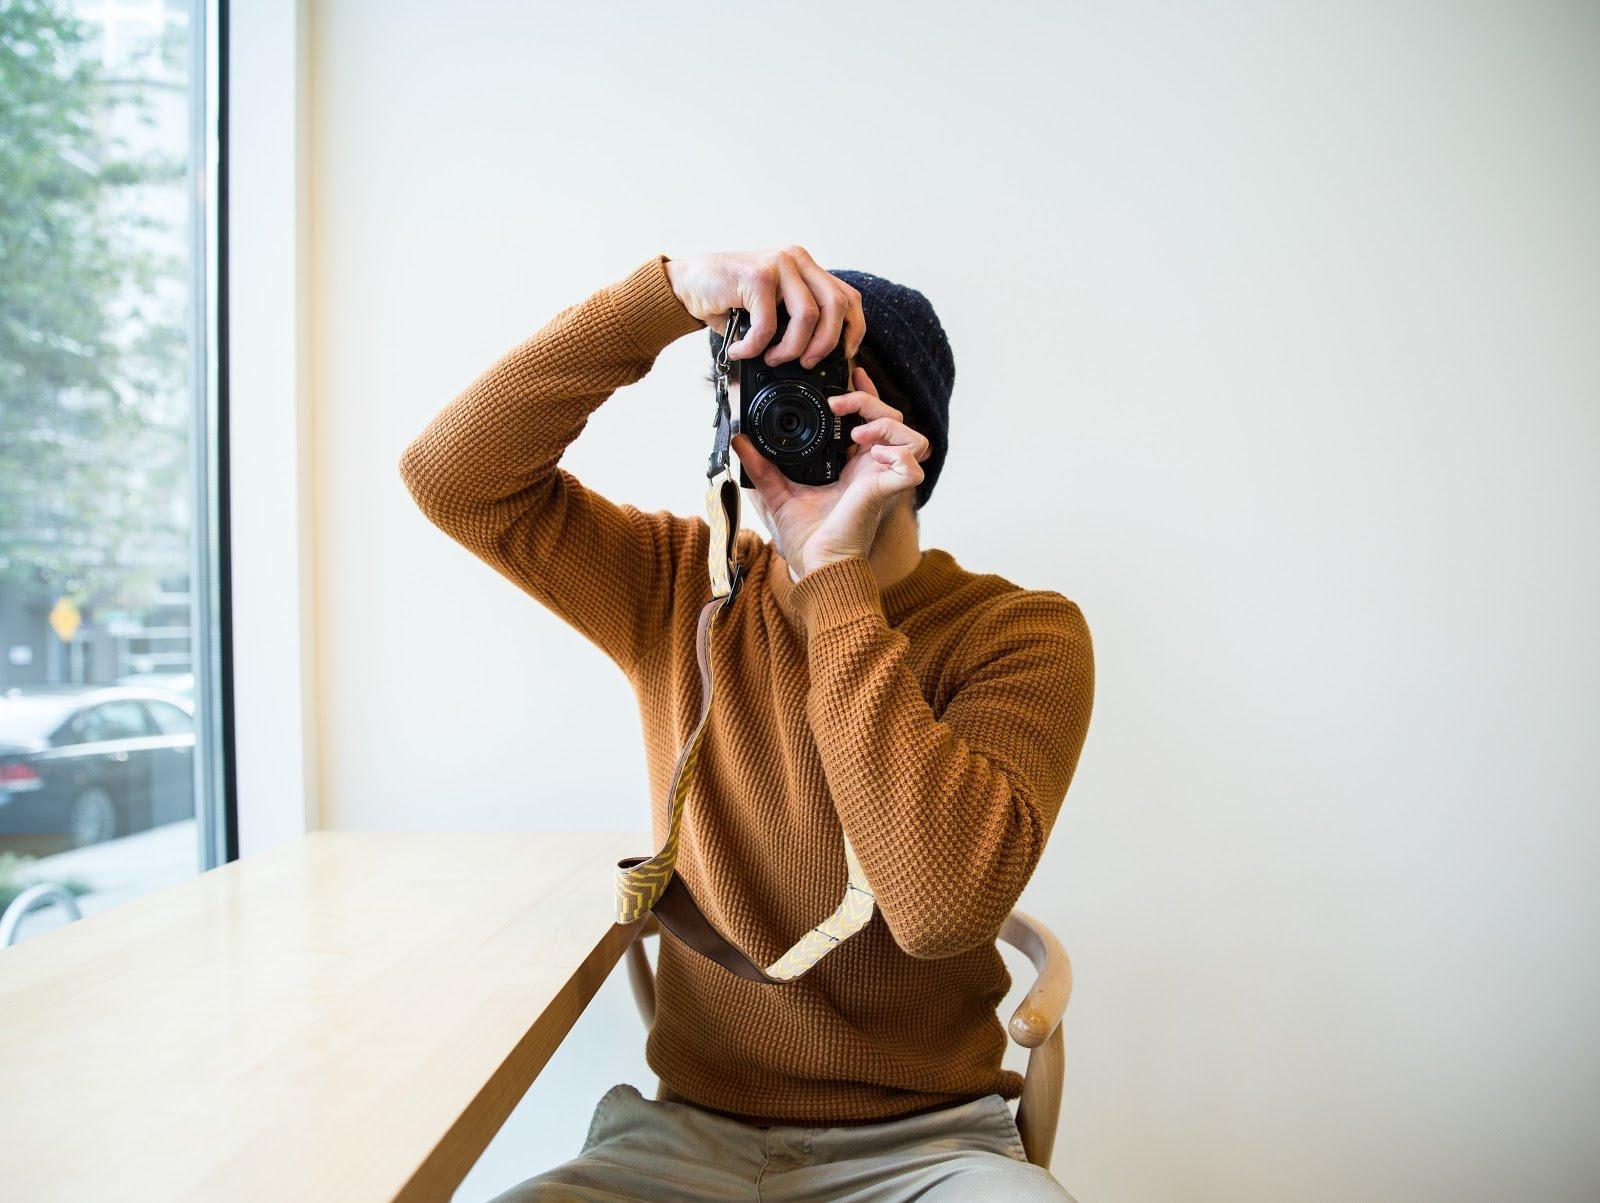 Photographer self portrait by Jeslyn Chanchaleune